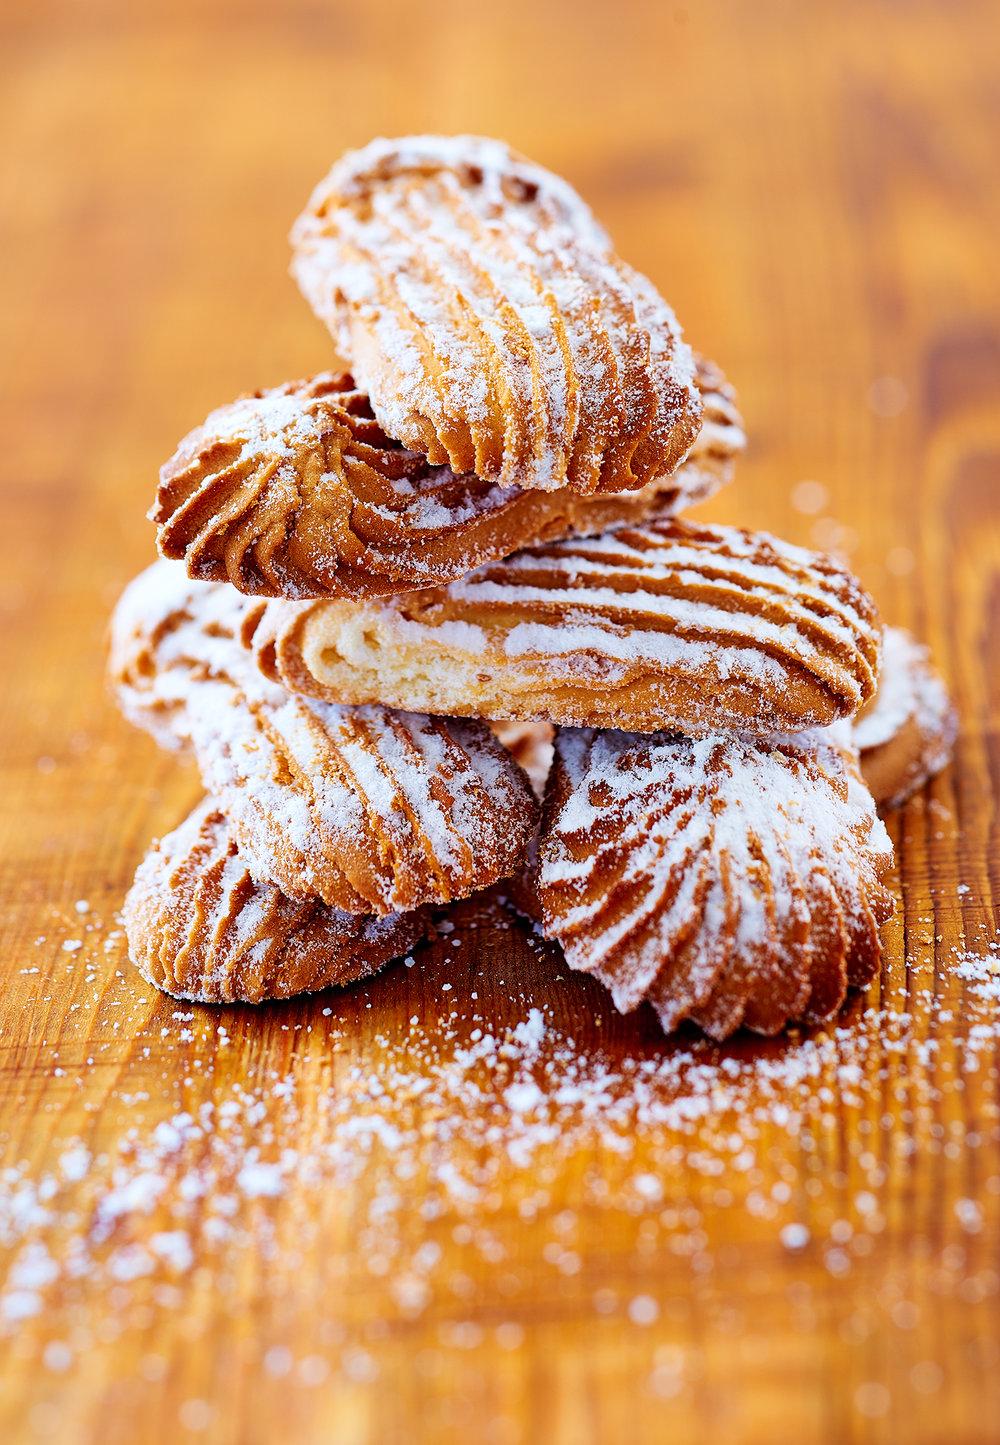 12_French-almond-cookies-madelines_0164_original.jpg